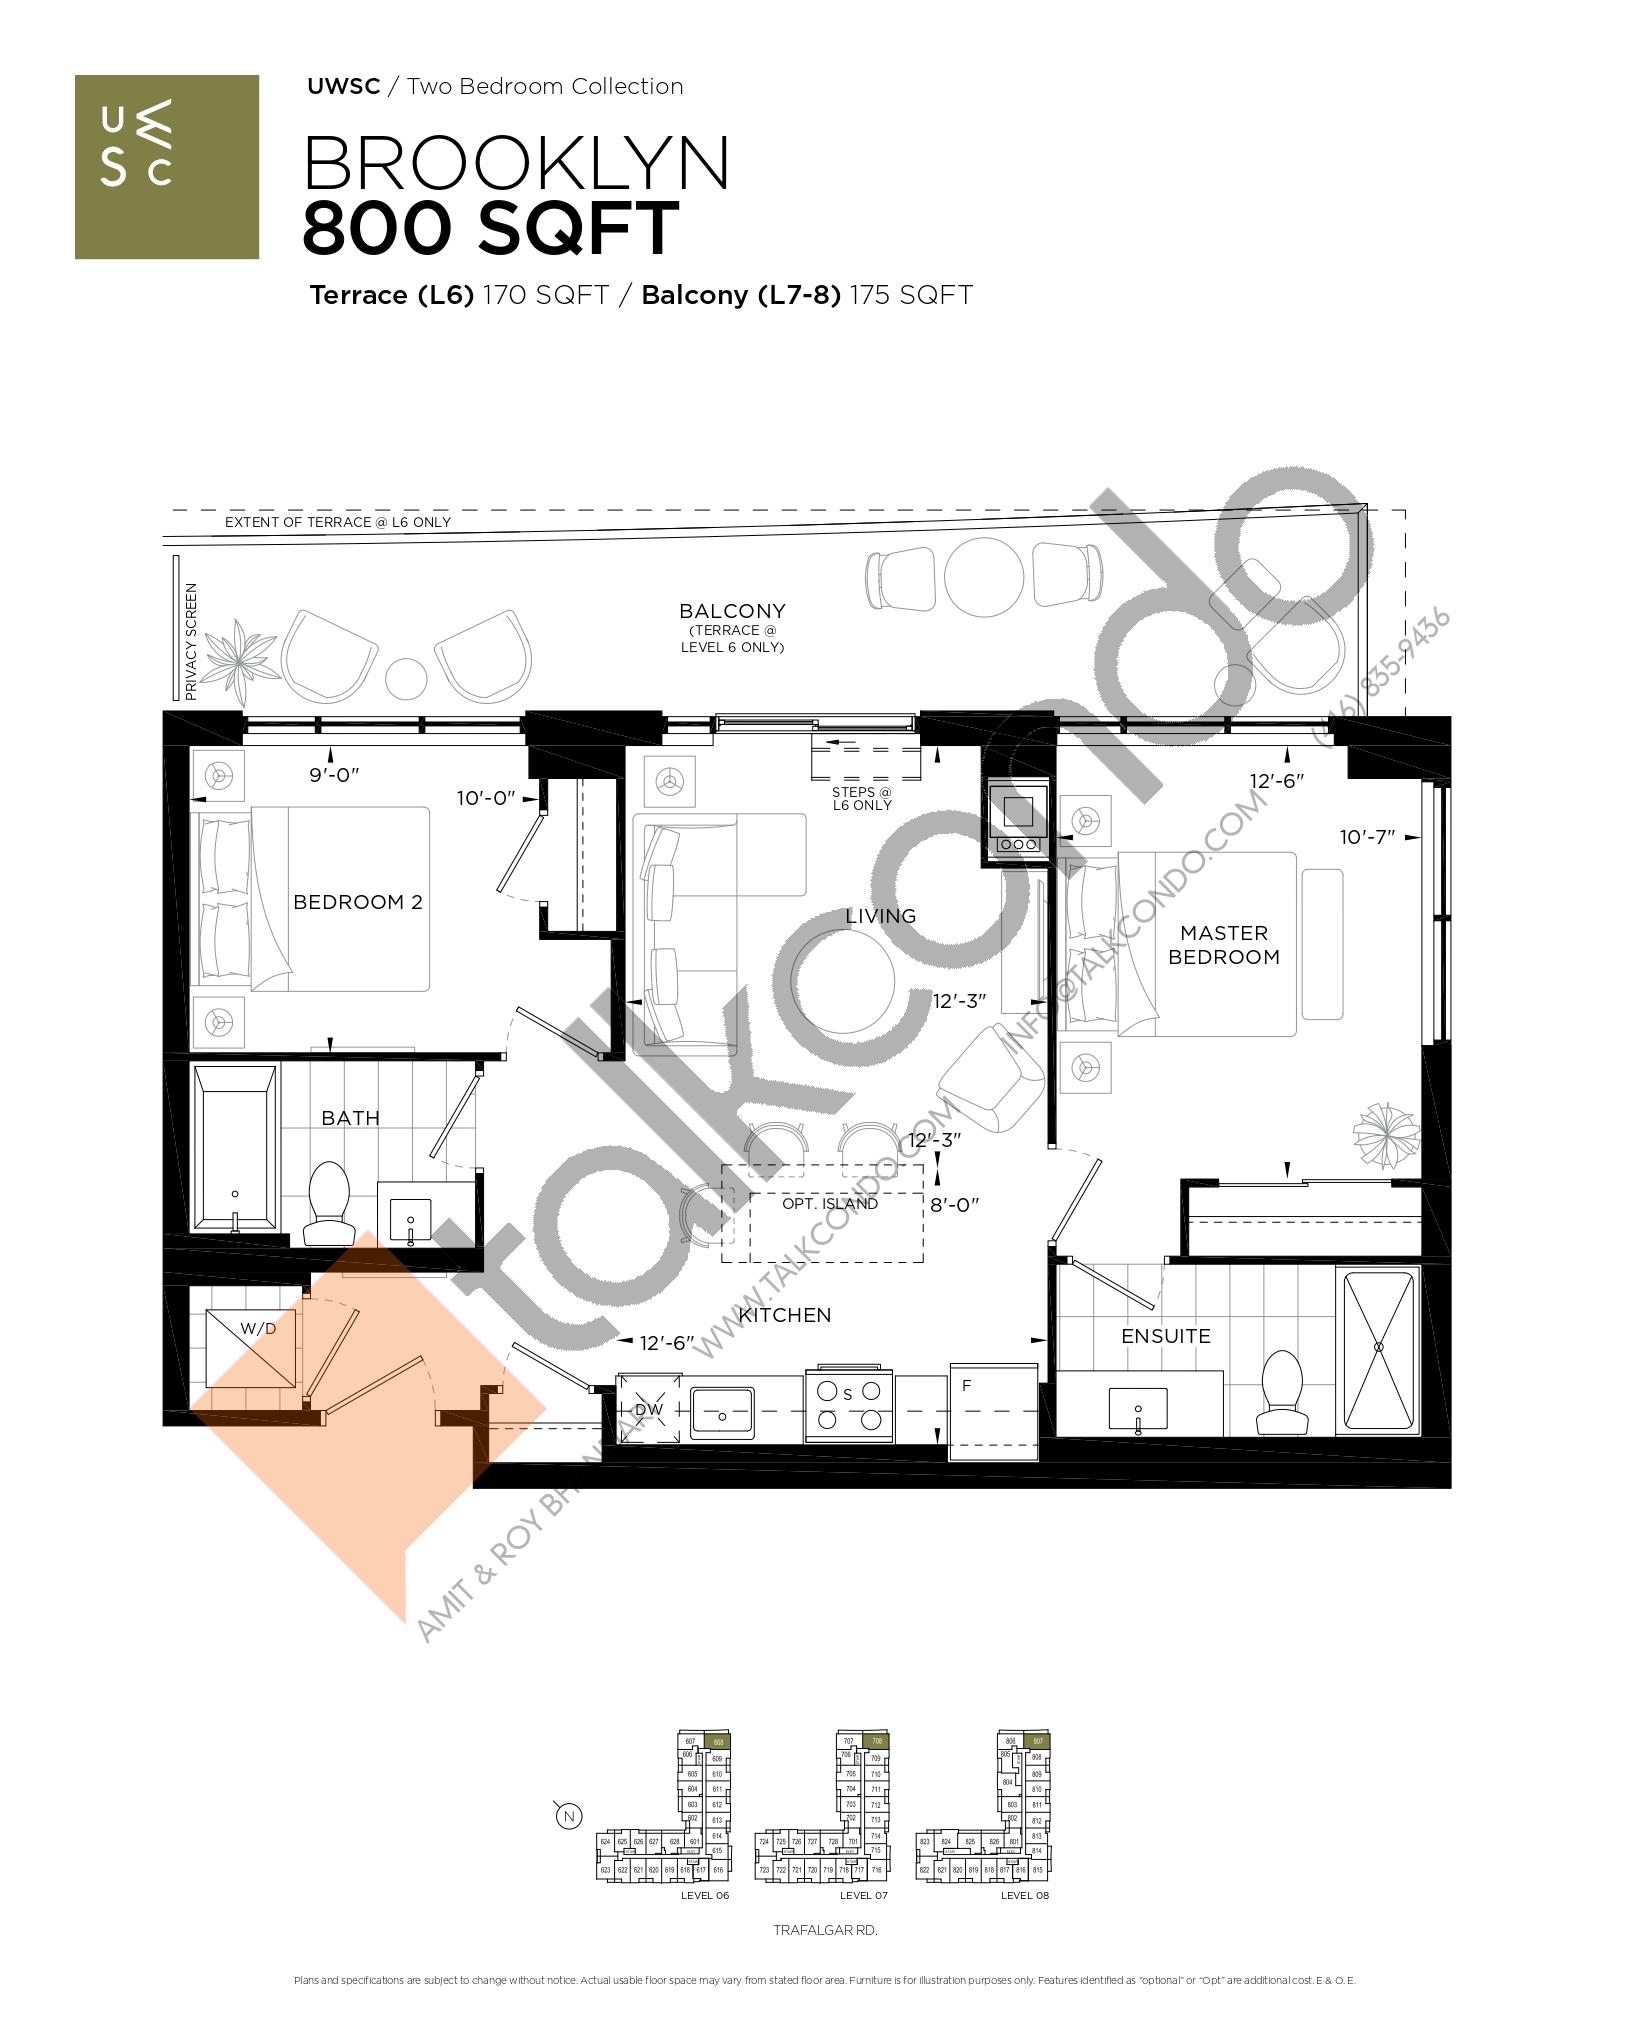 Brooklyn Floor Plan at Upper West Side Condos at Oakvillage - 800 sq.ft